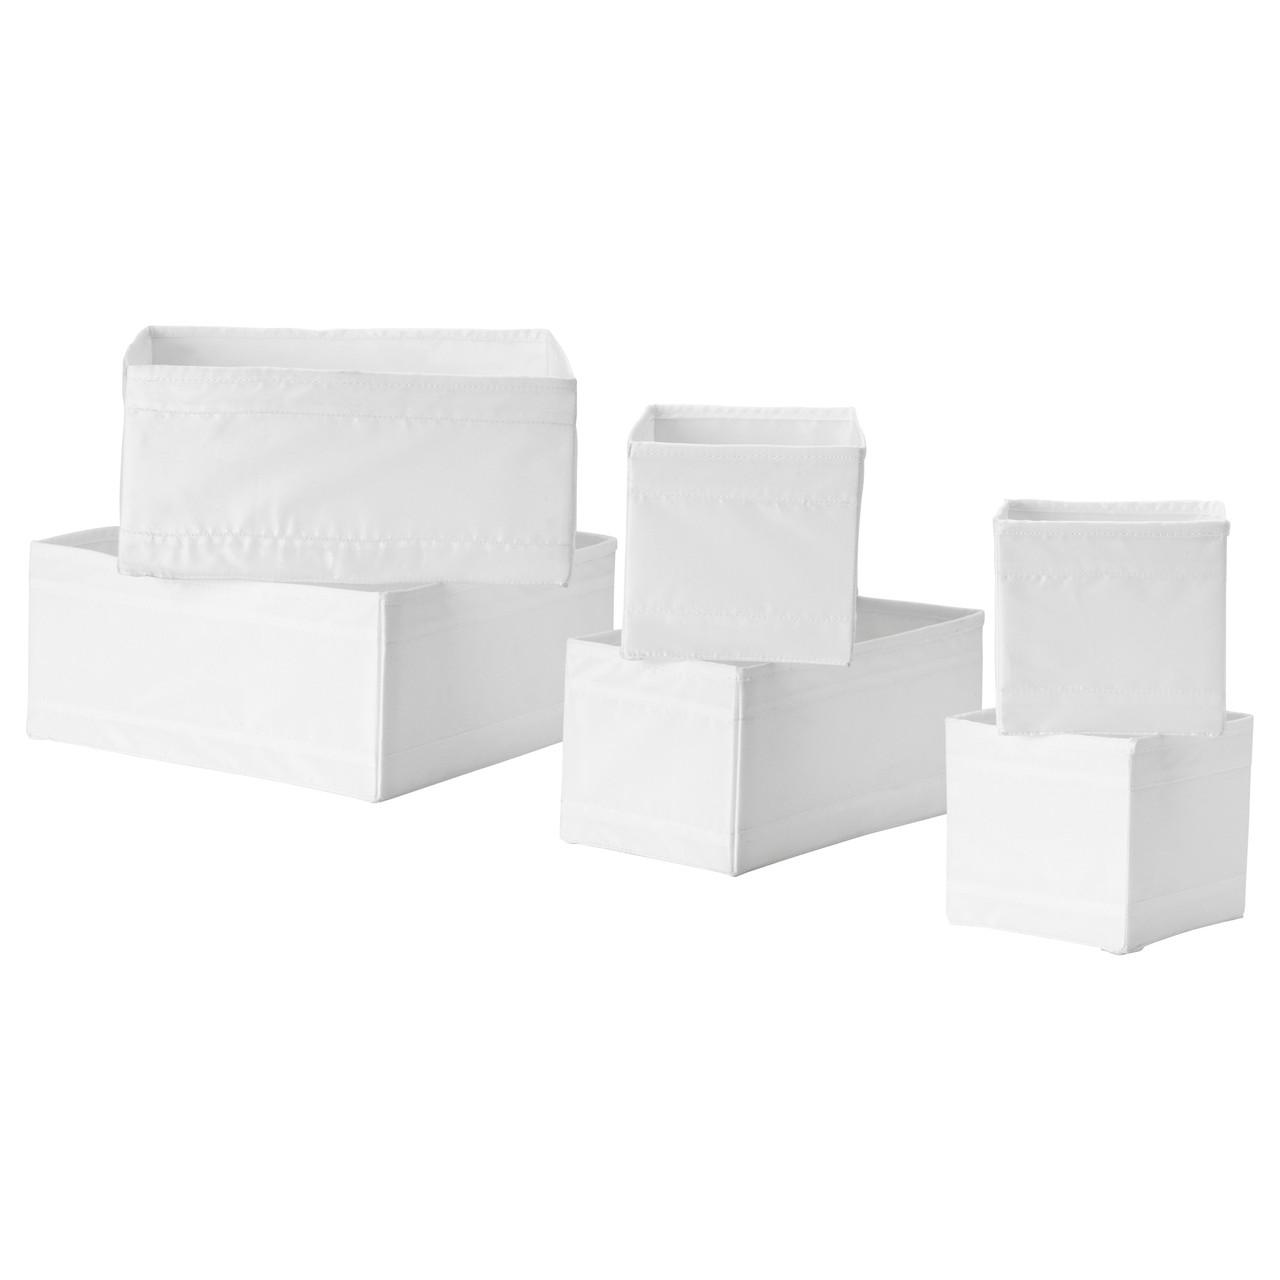 Набор коробок IKEA SKUBB 6 шт белые 004.285.49